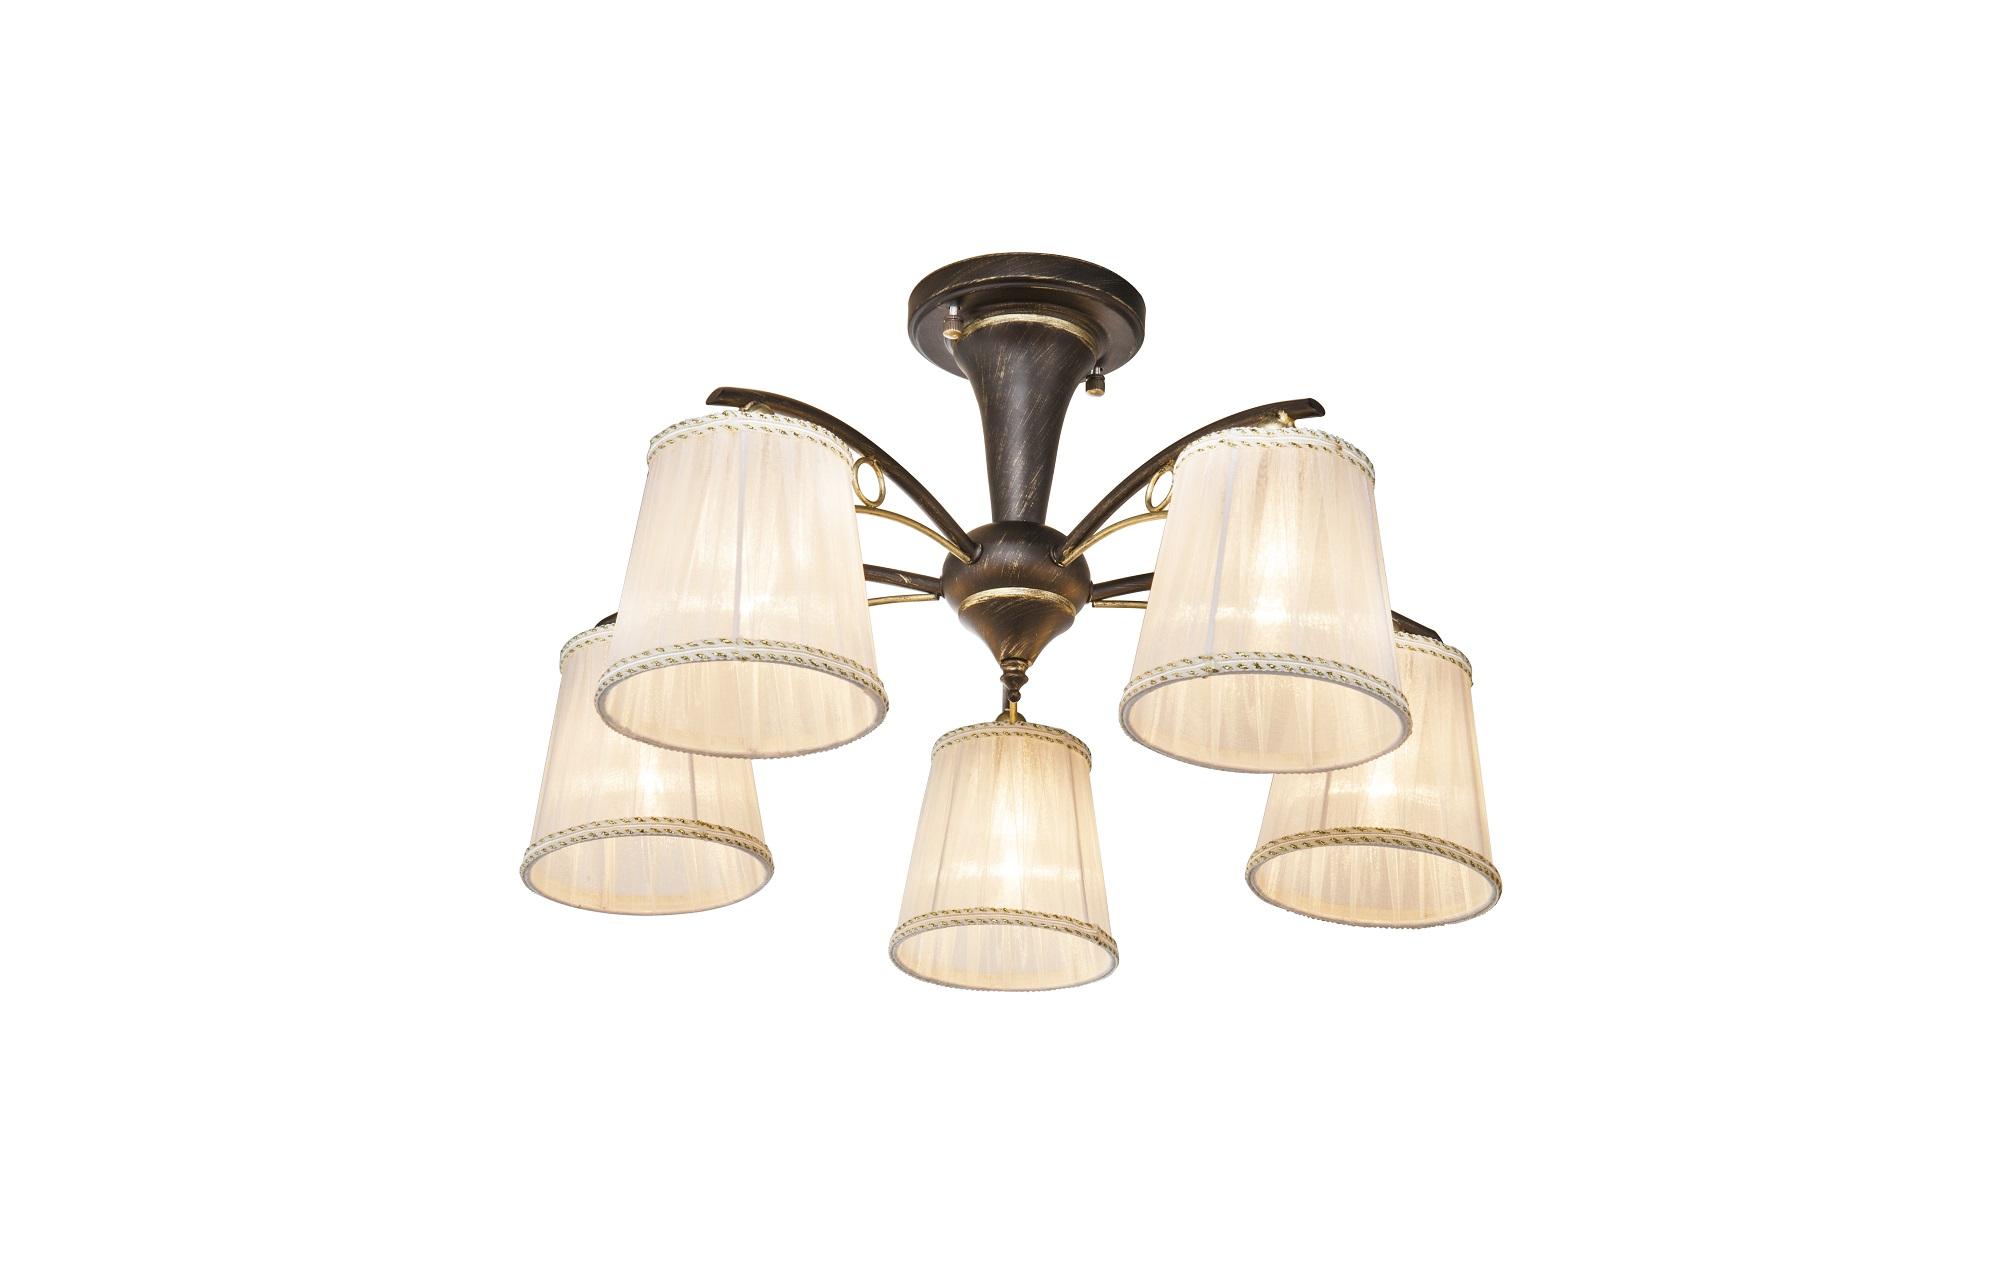 ЛюстраЛюстры потолочные<br>Вид цоколя: E14Мощность: 60WКоличество ламп: 5Материал: металл, текстиль<br><br>kit: None<br>gender: None